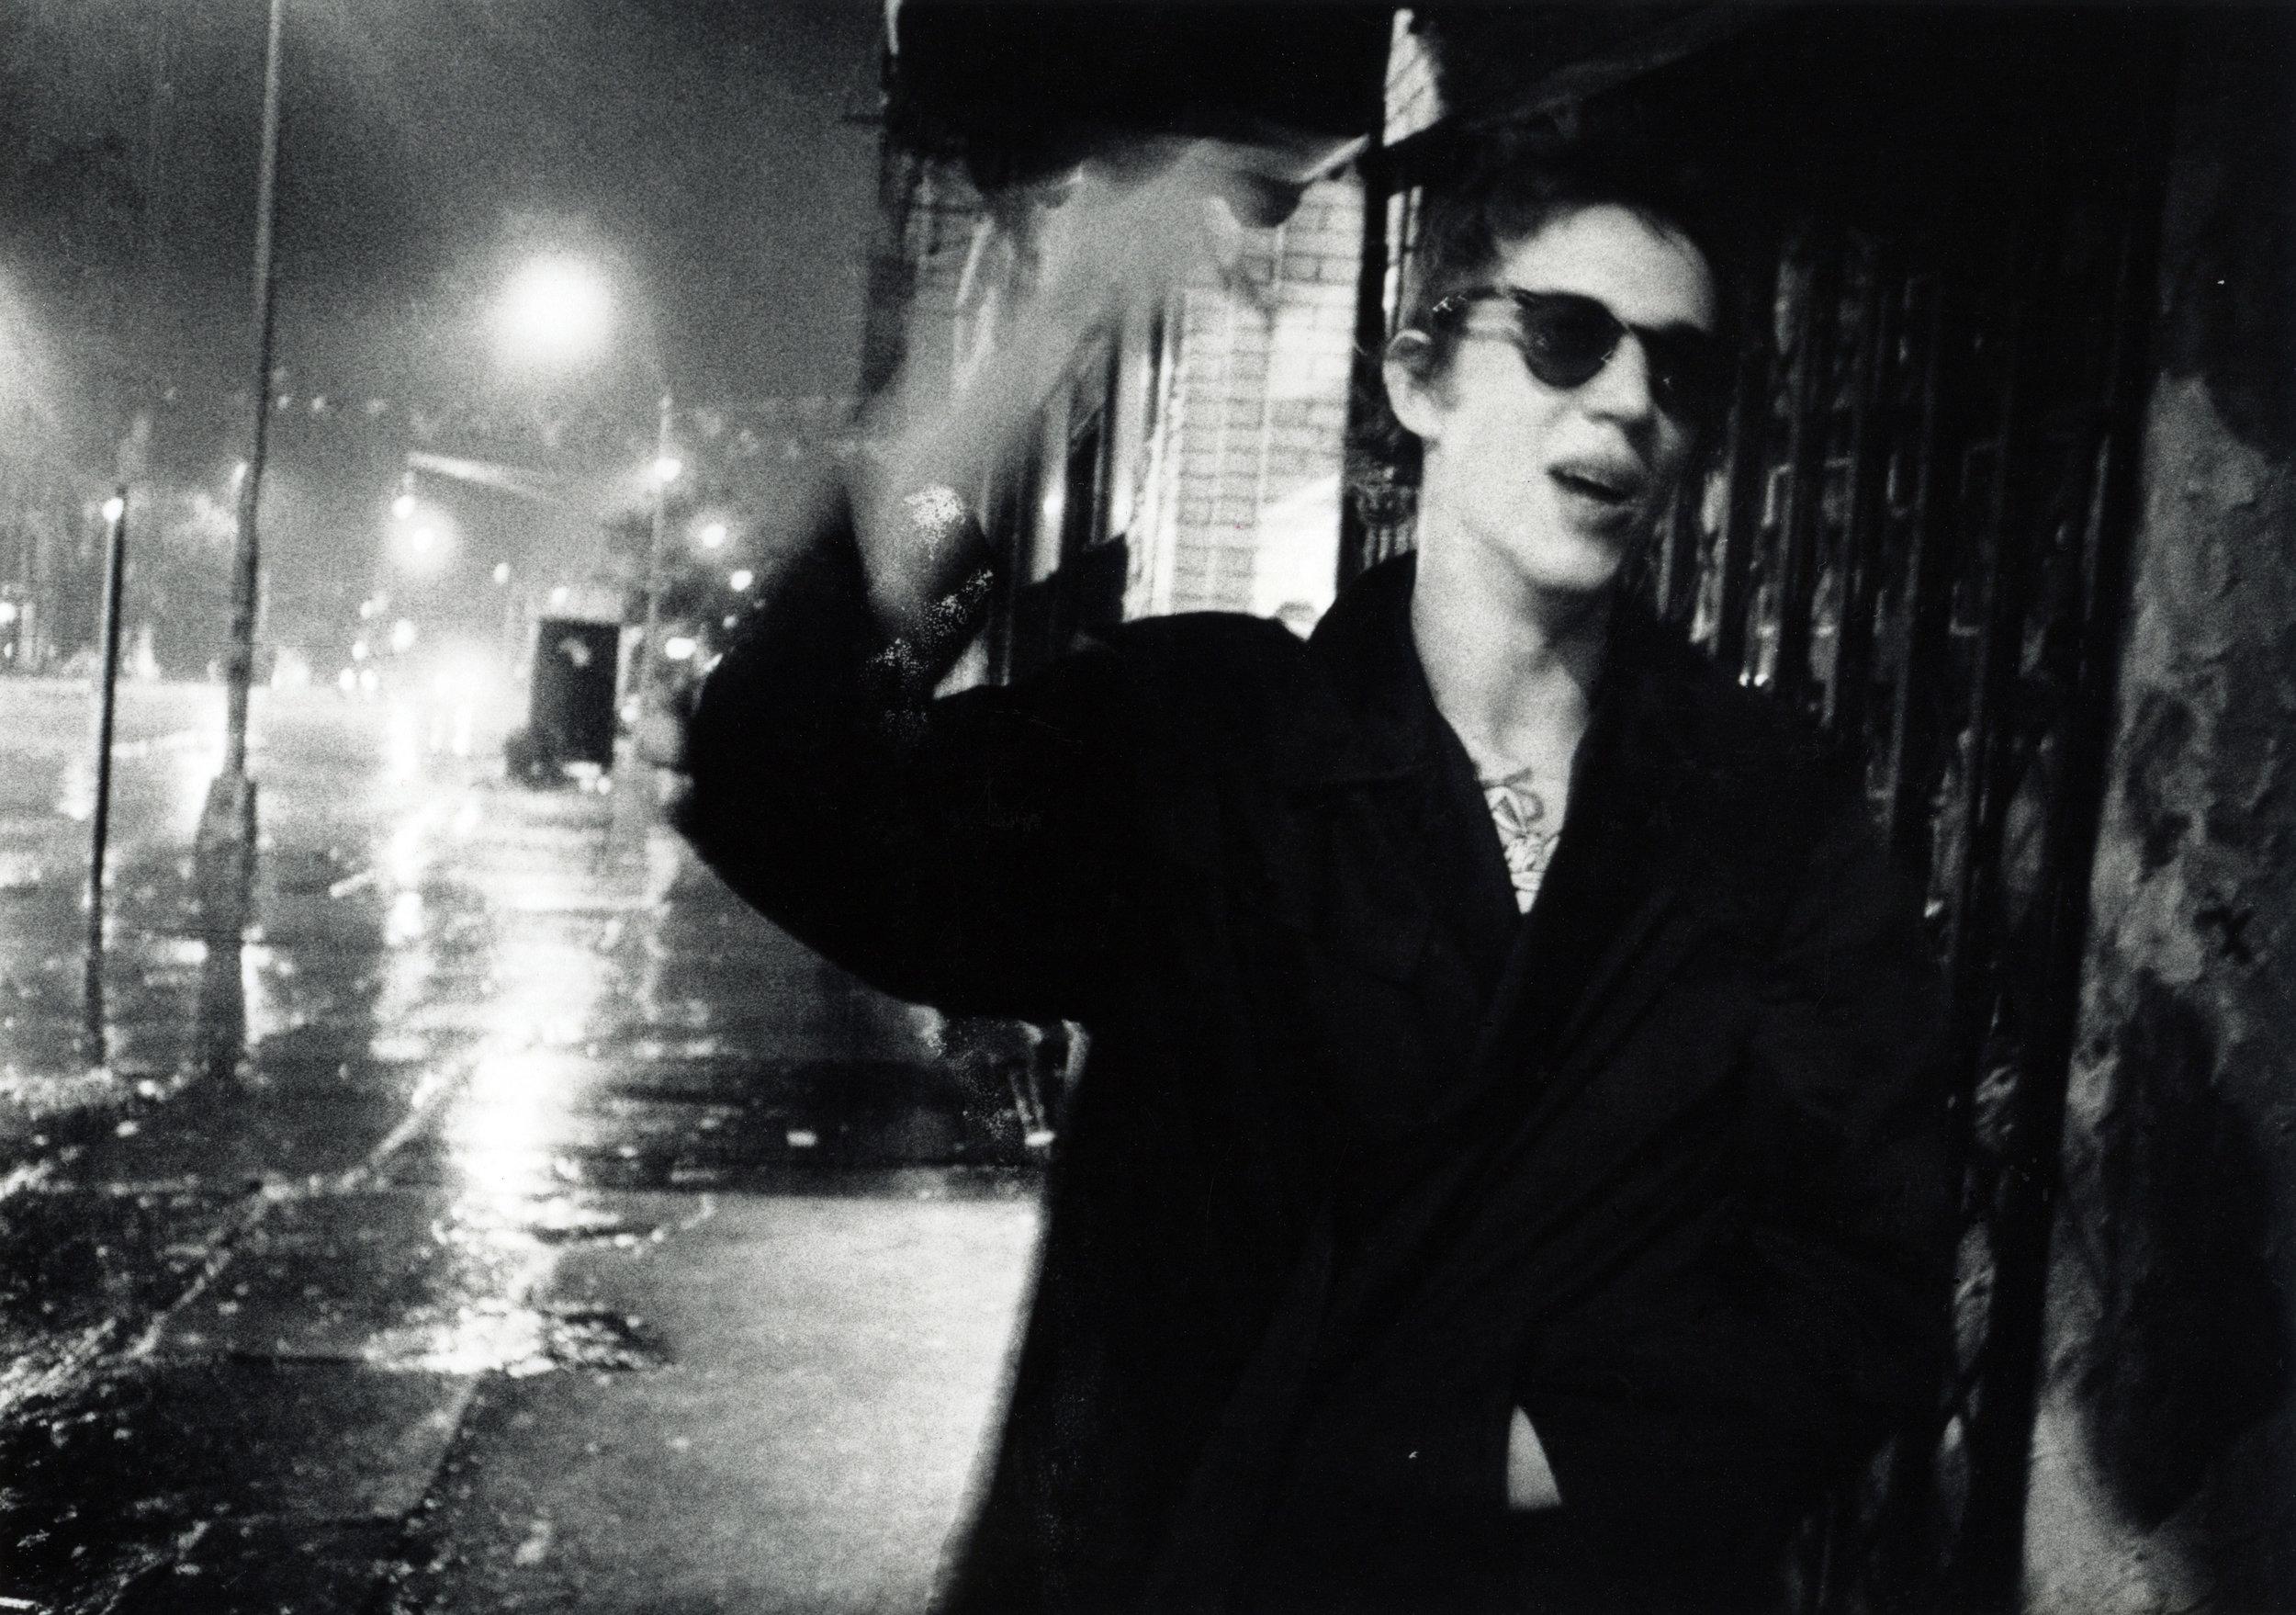 Richard Hell, Bowery Rainstorm, 1977